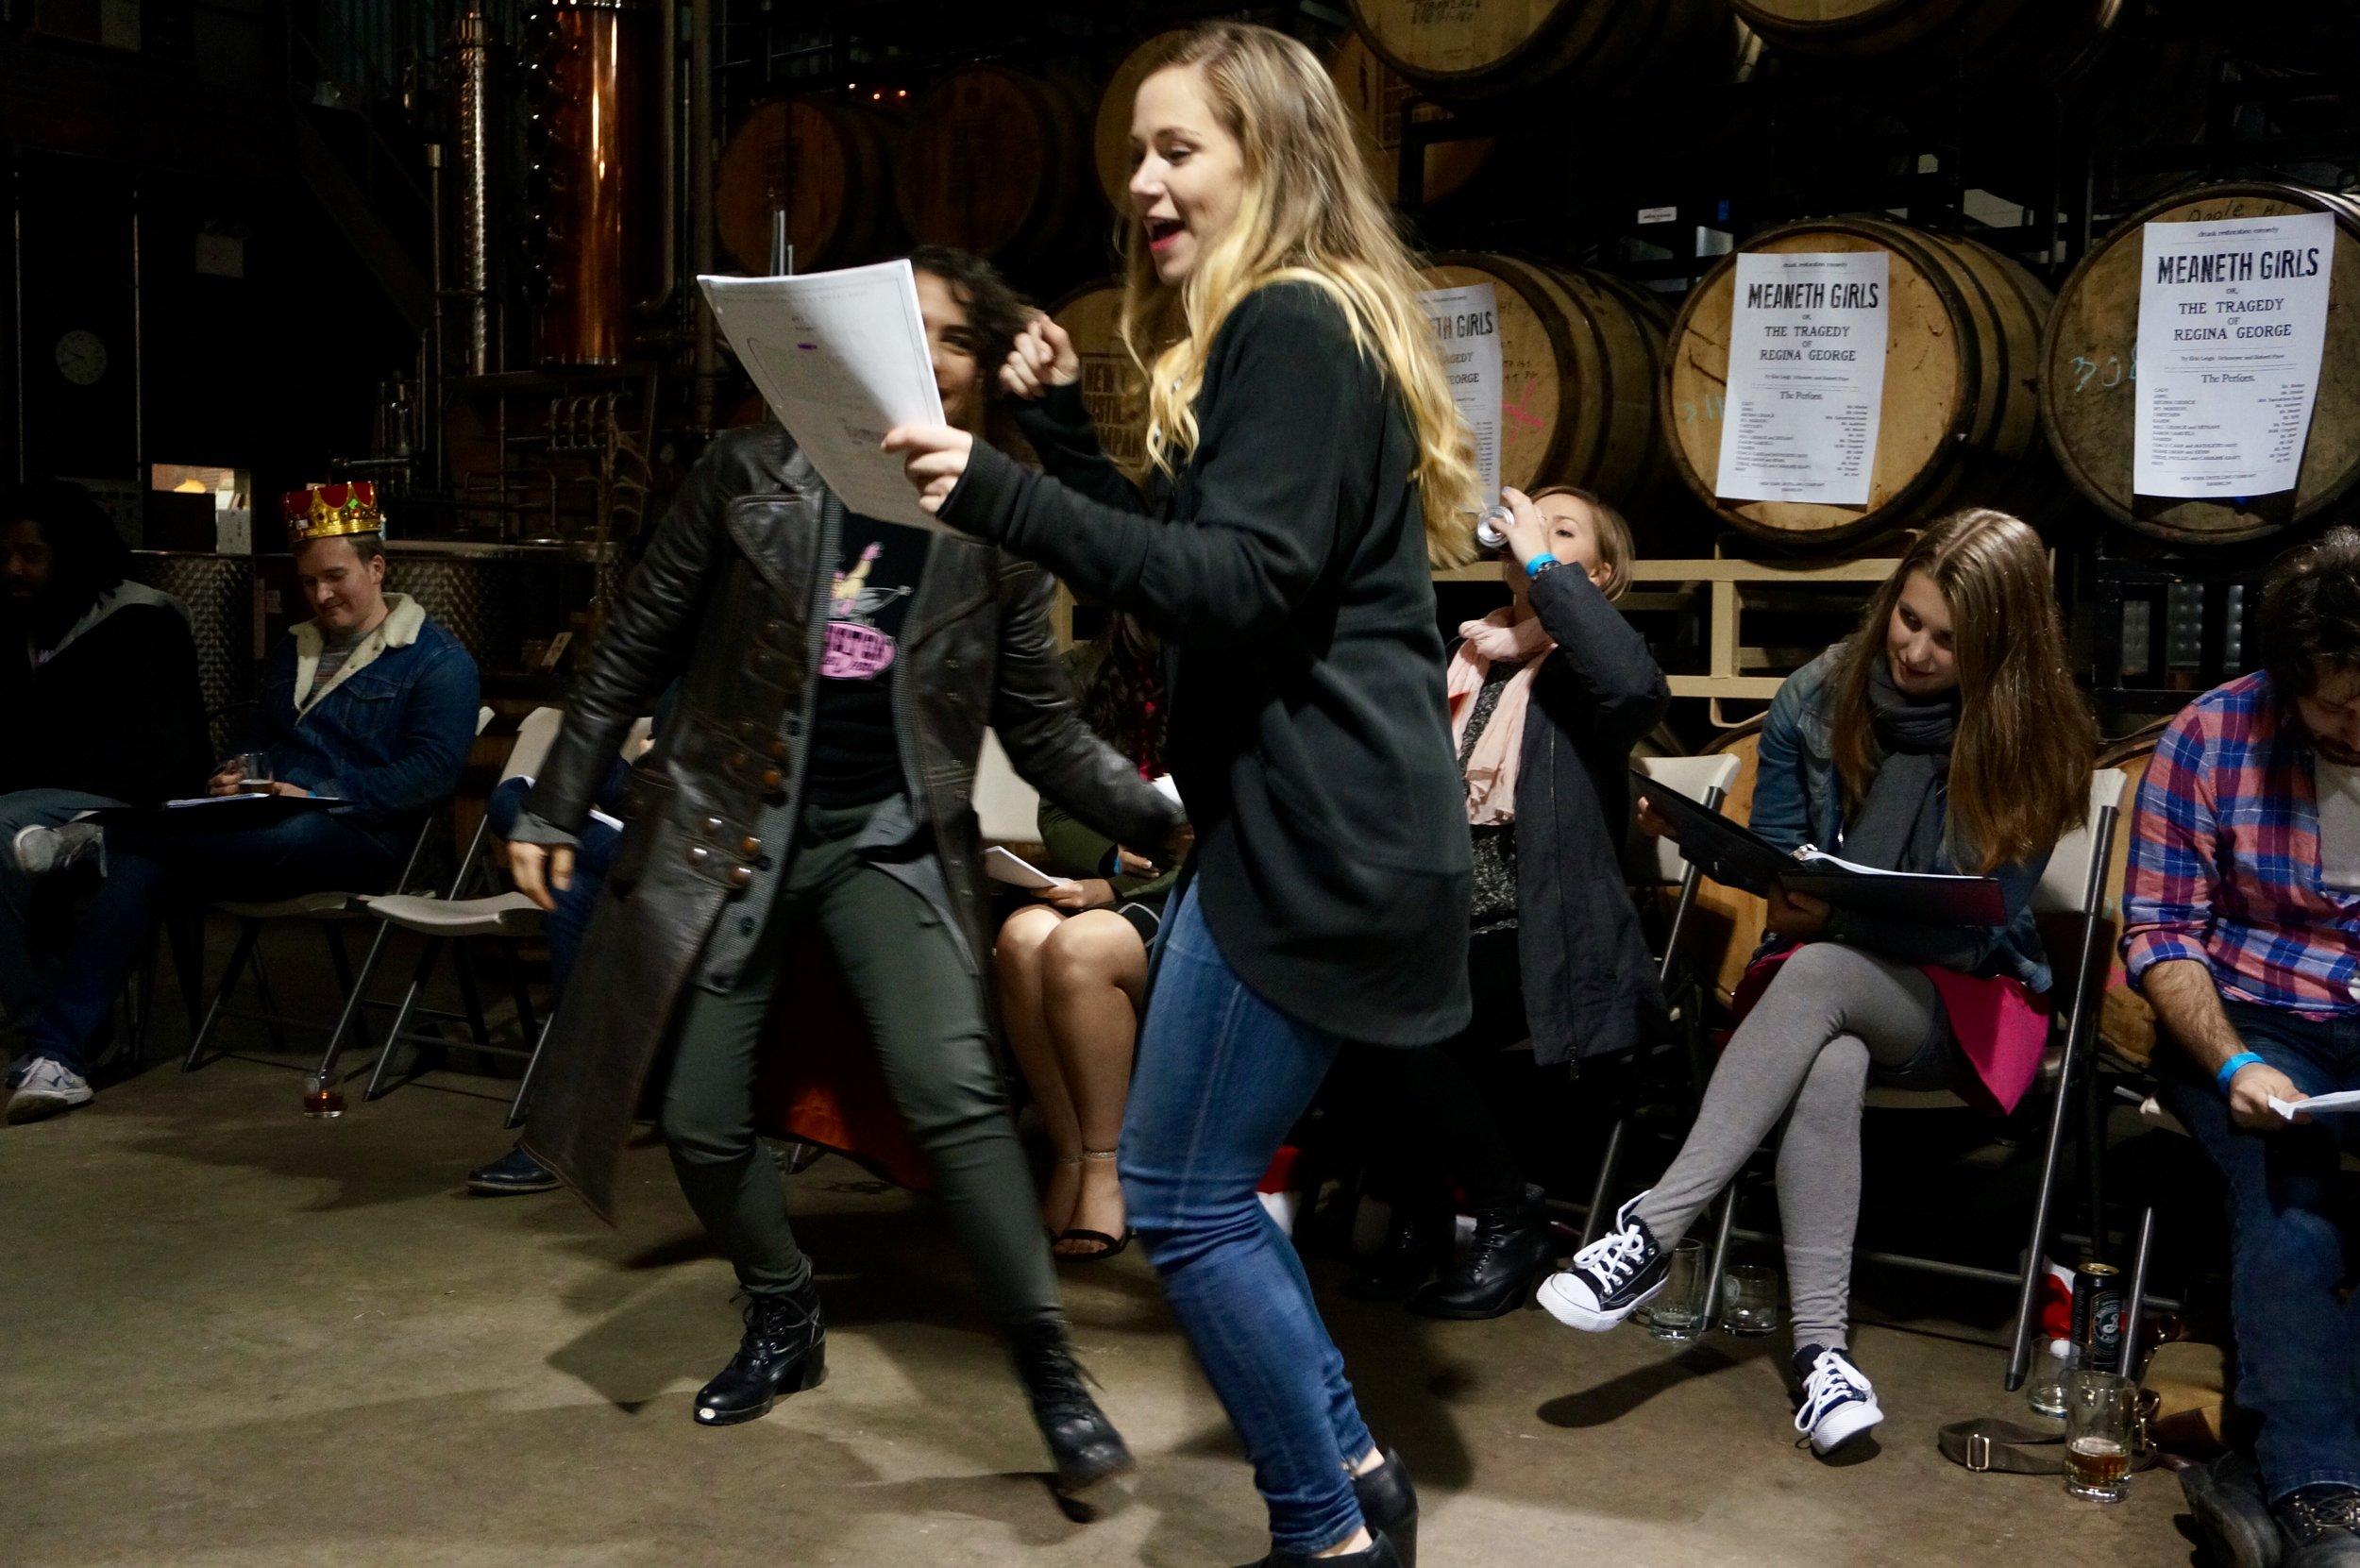 Drunk Restoration Comedy presents  Meaneth Girls: The Tragedy of Regina George. 2017.